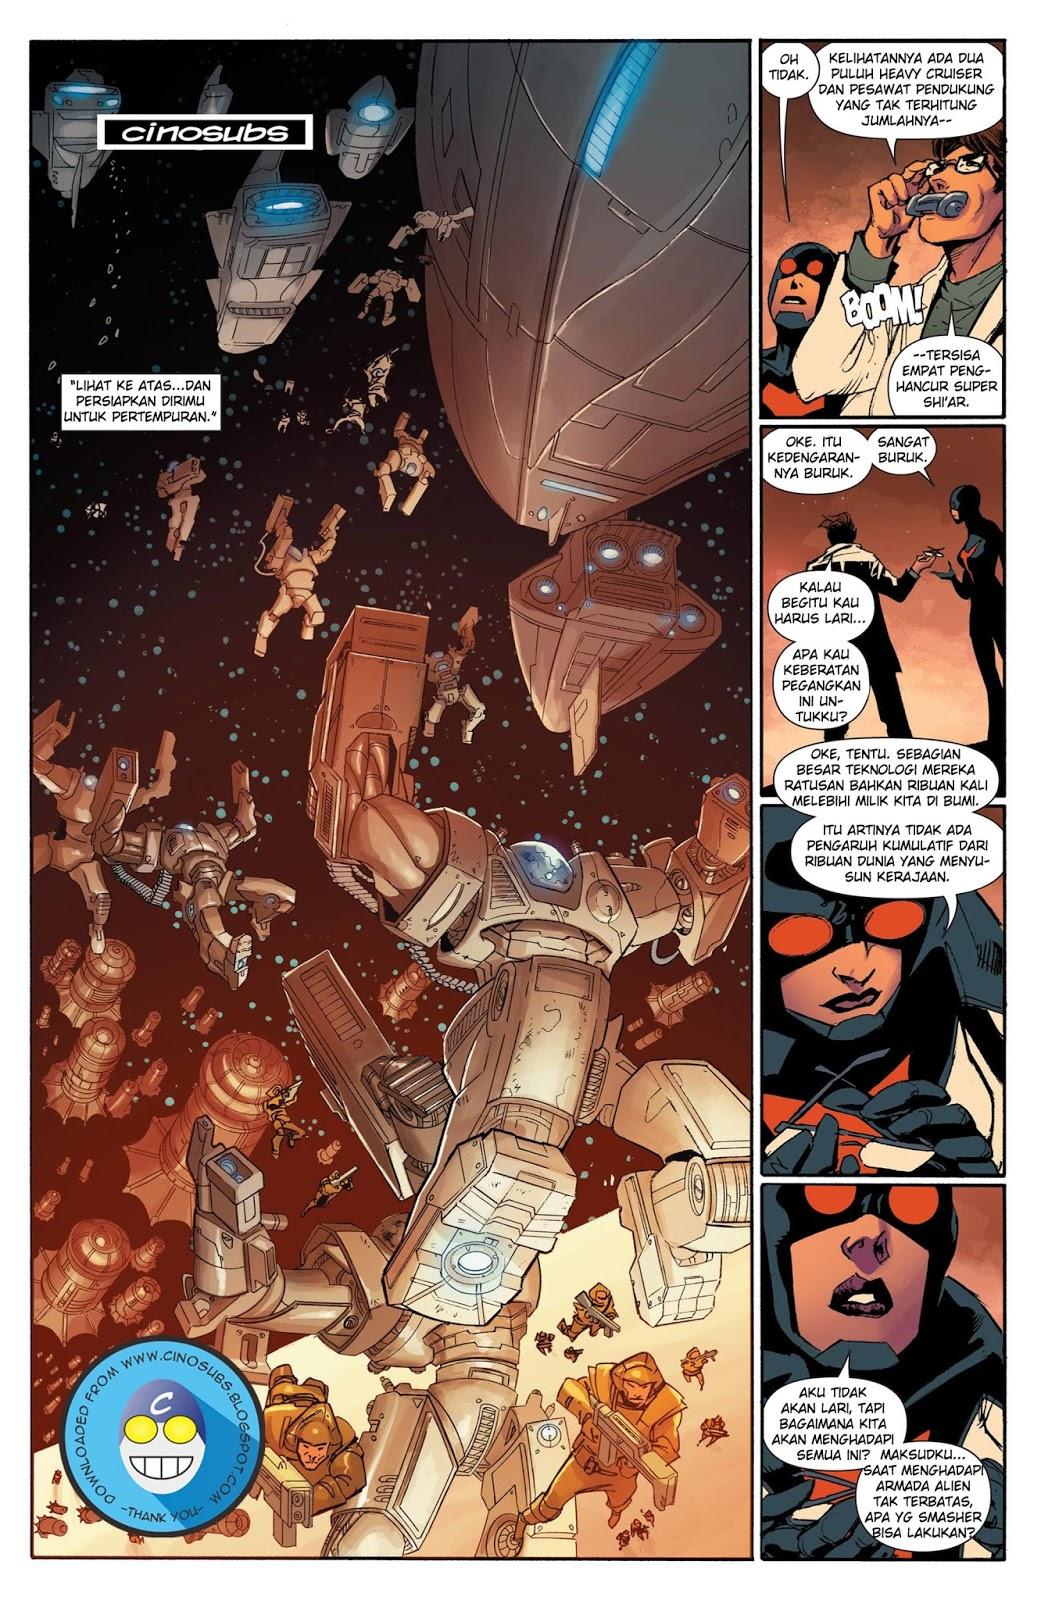 komik the avengers #5 (2012) - komik pos - baca komik